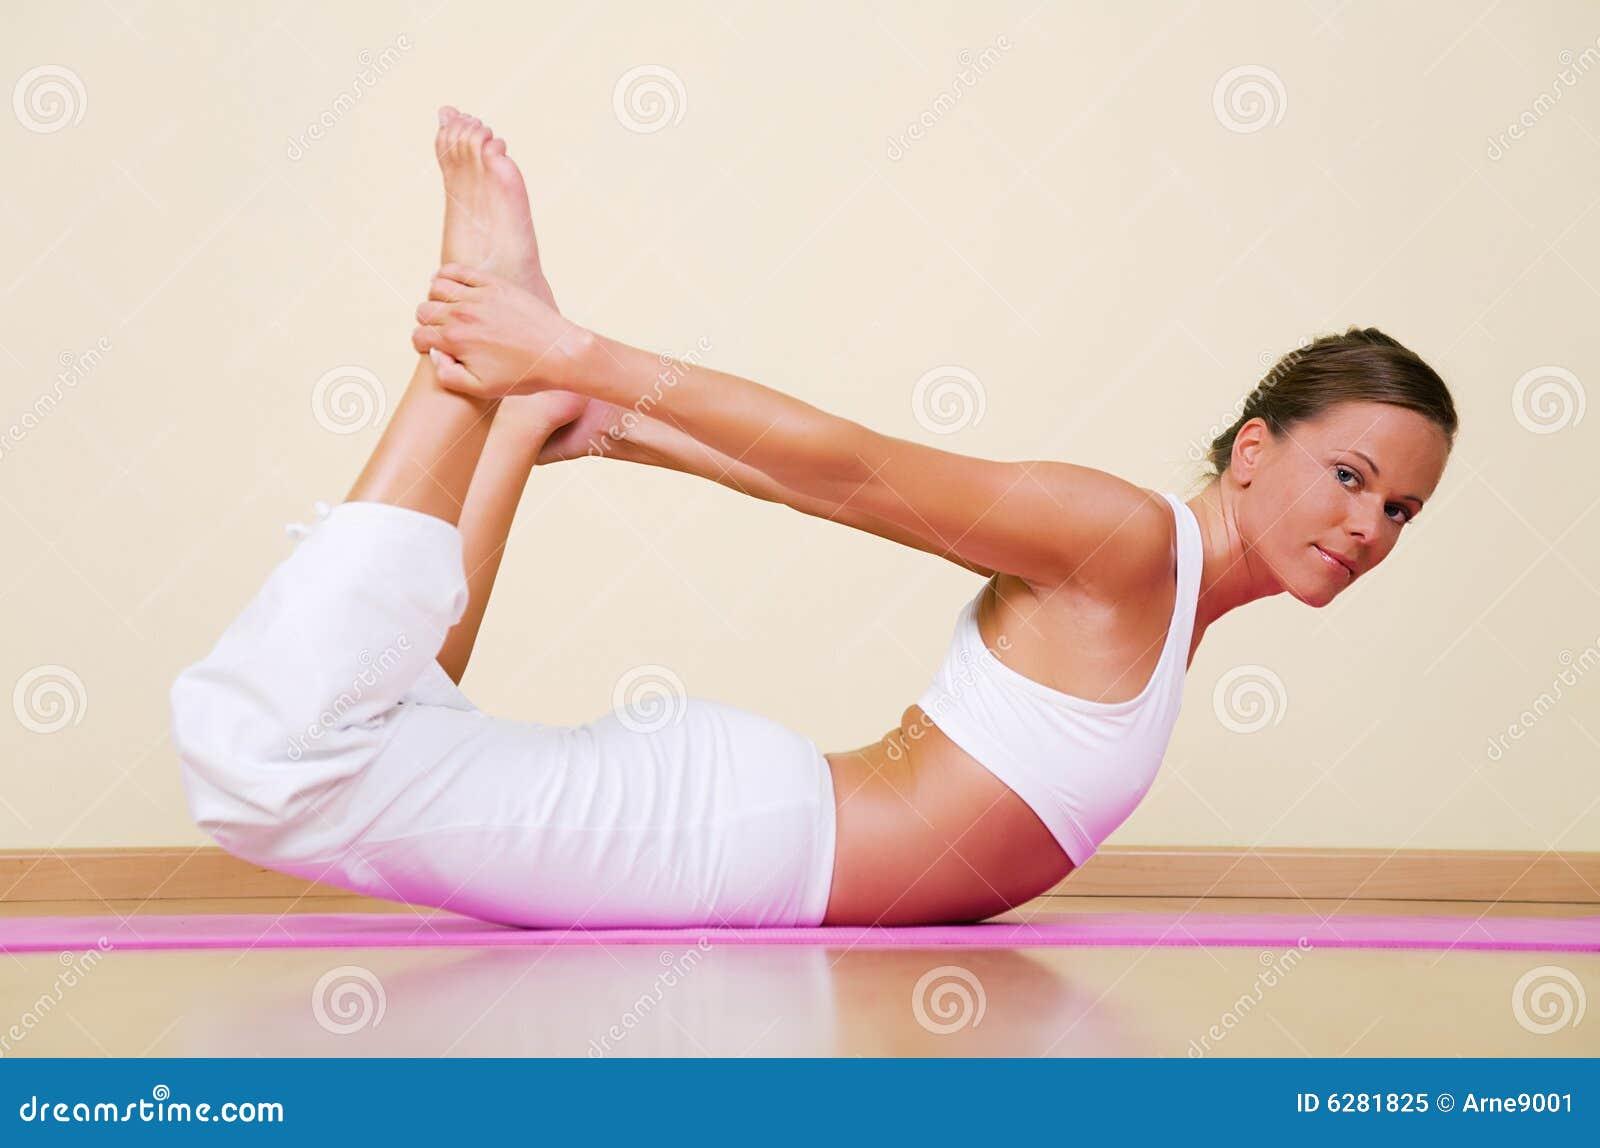 Best Yoga Web Design